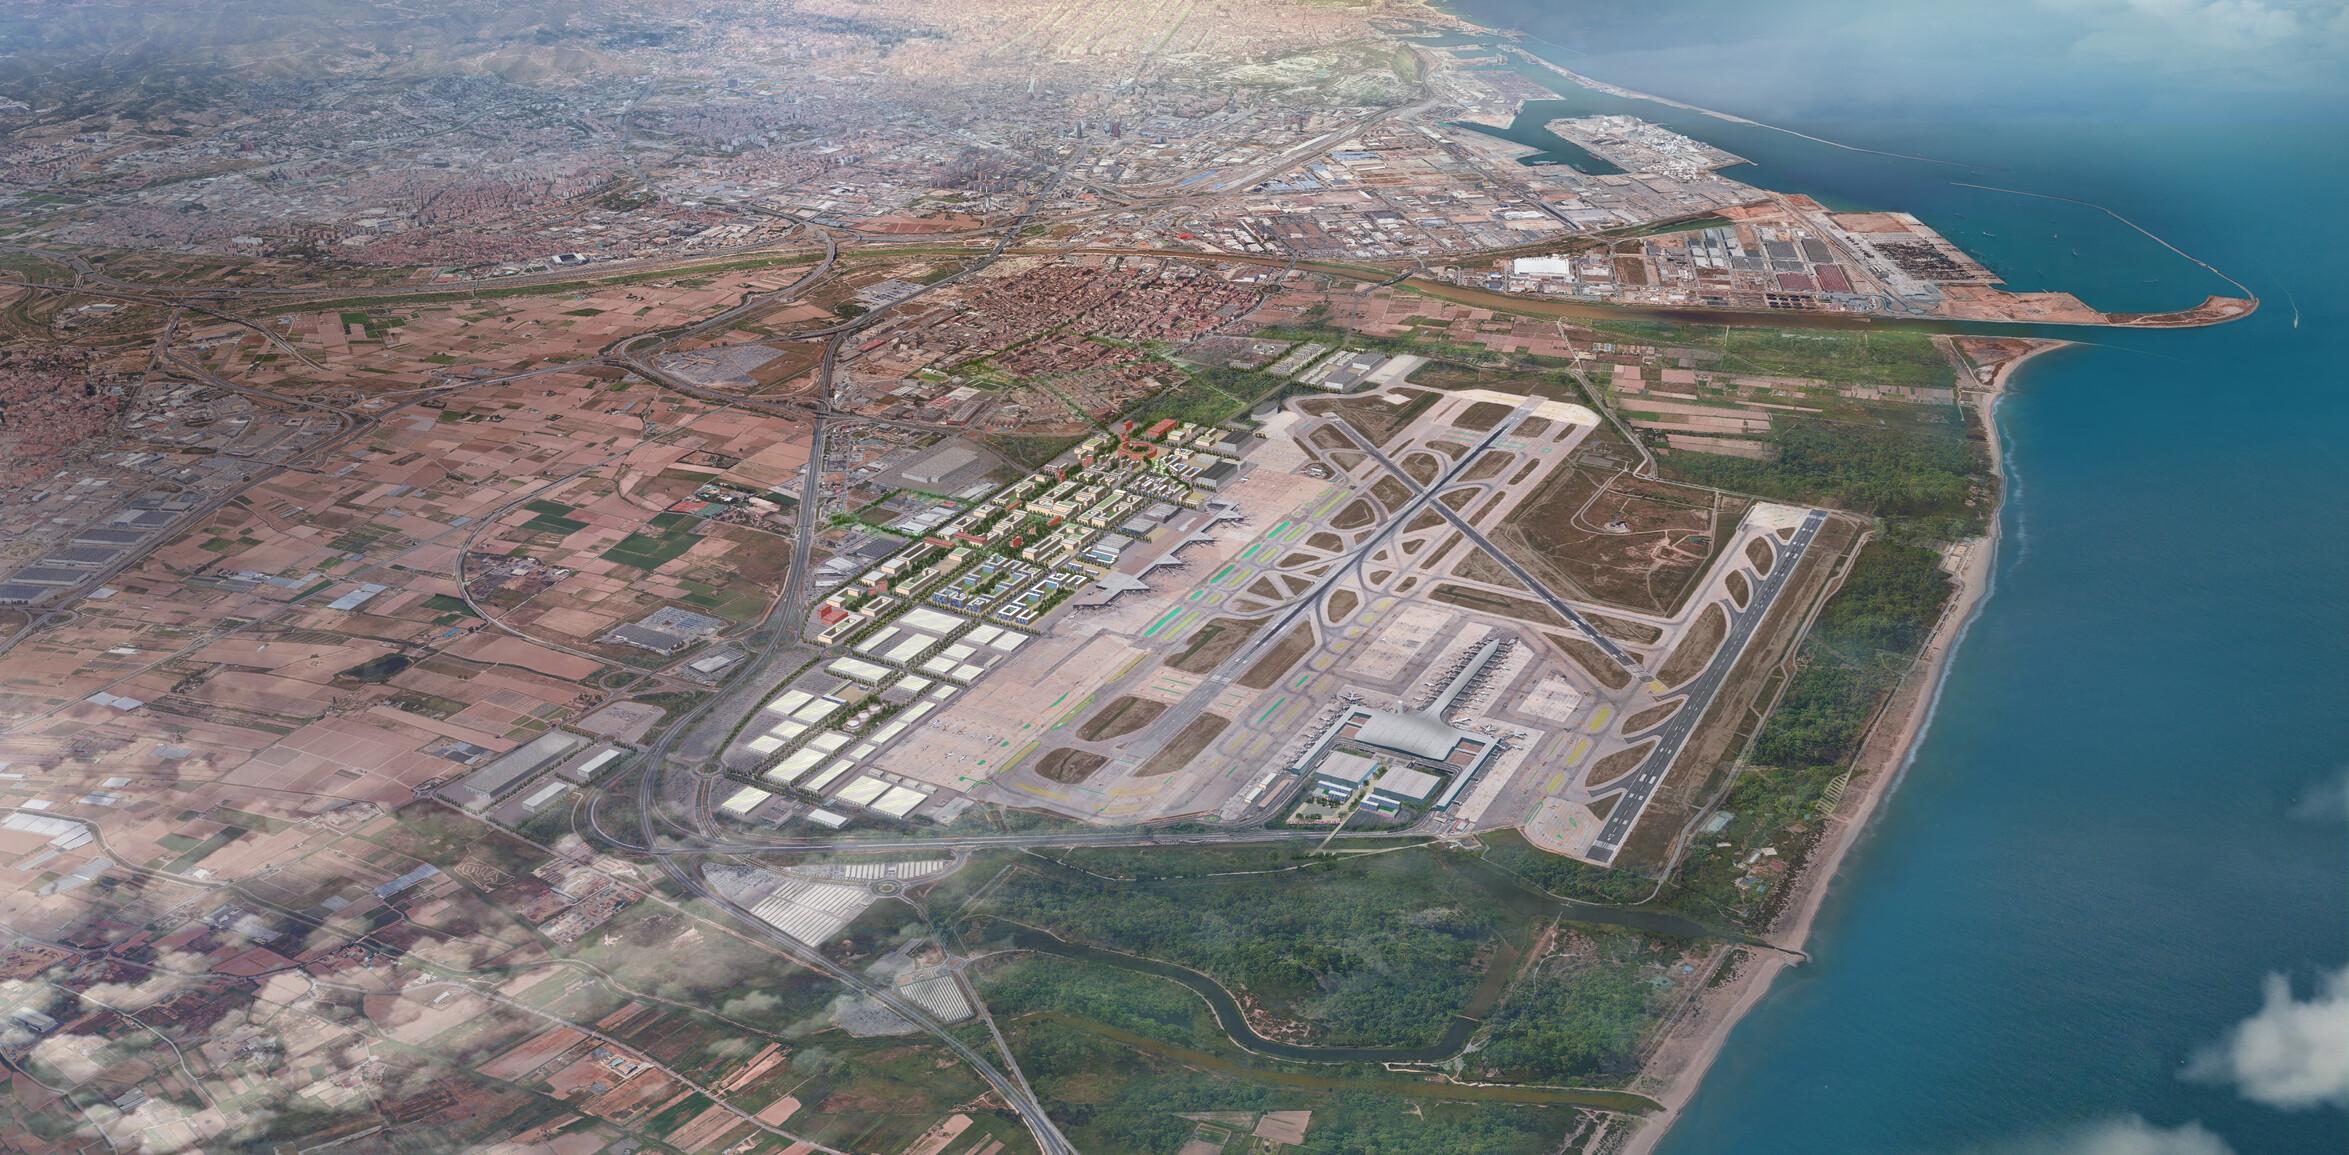 Barcelona-El Prat Airport Real Estate Masterplan © Arup